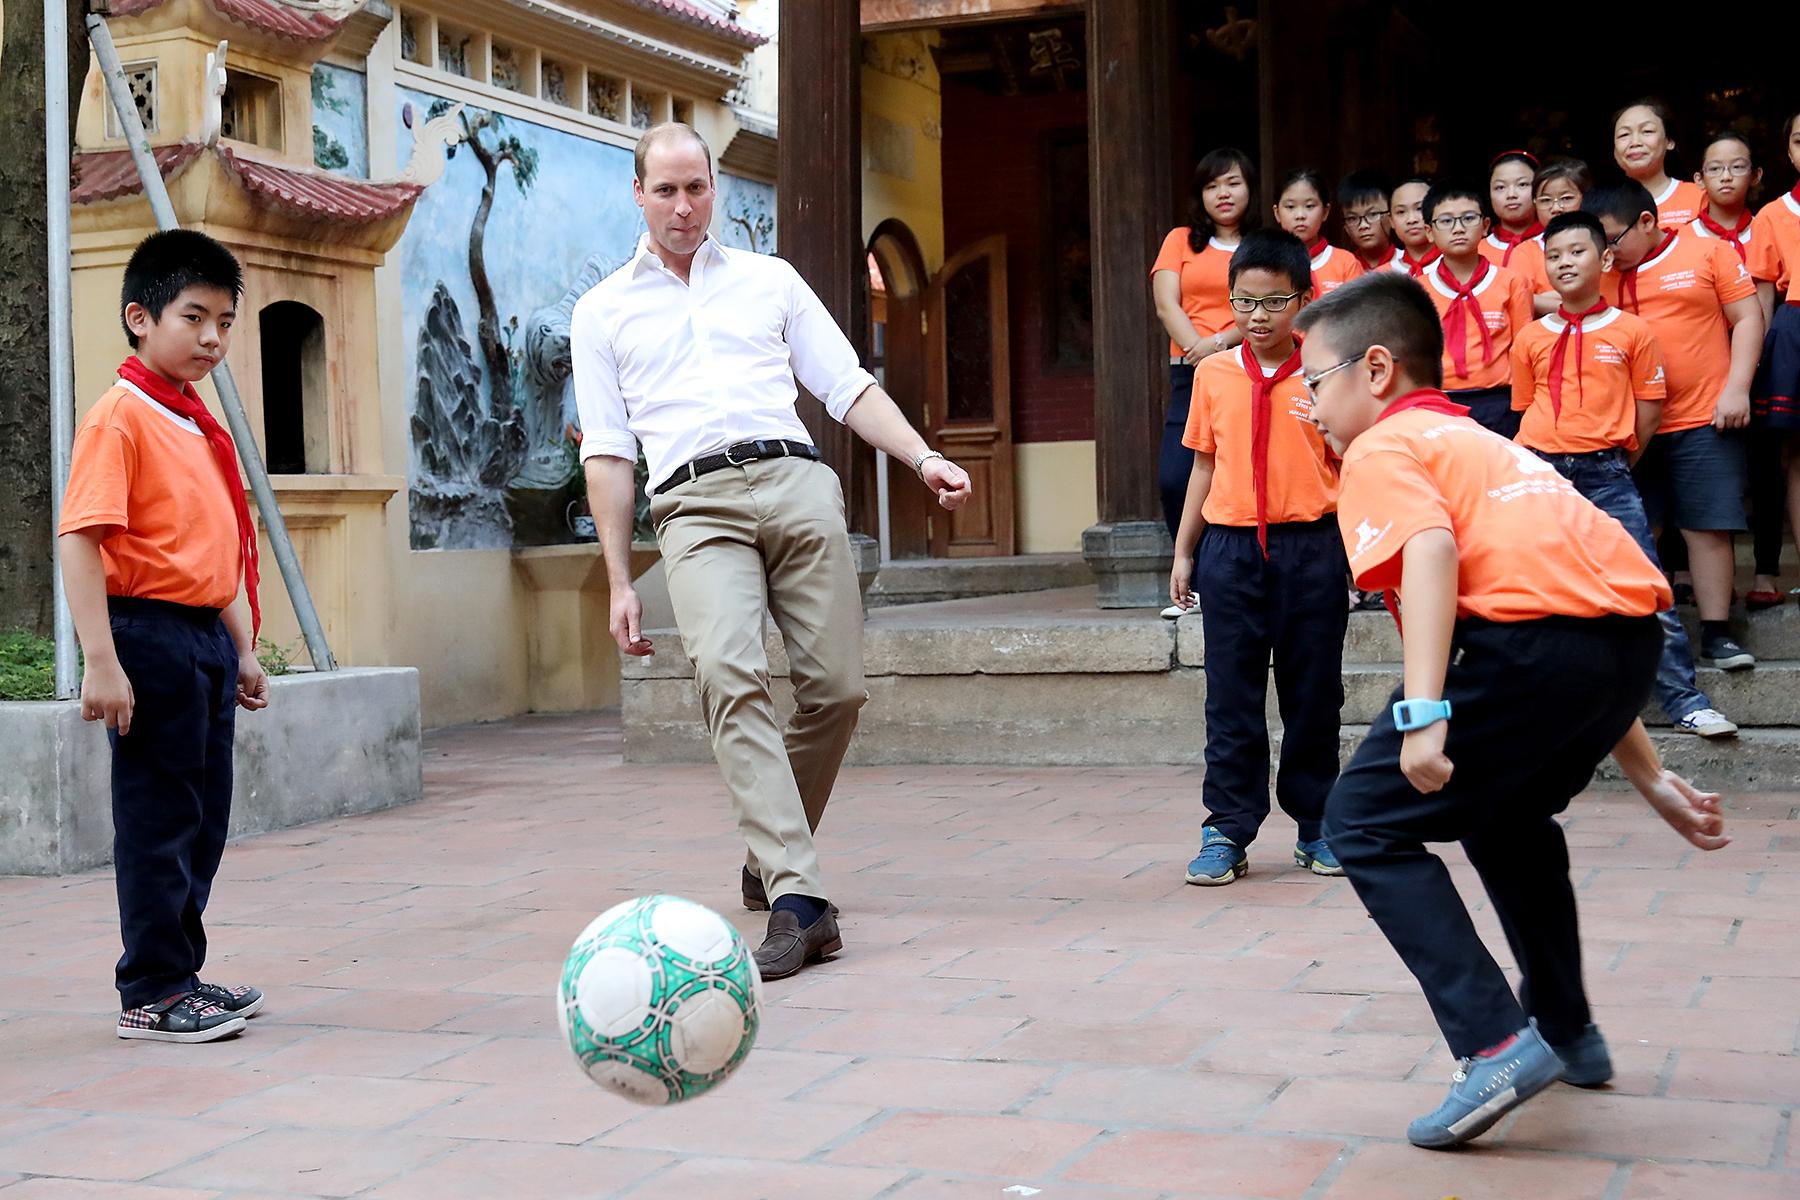 Prince William Vietnam soccer